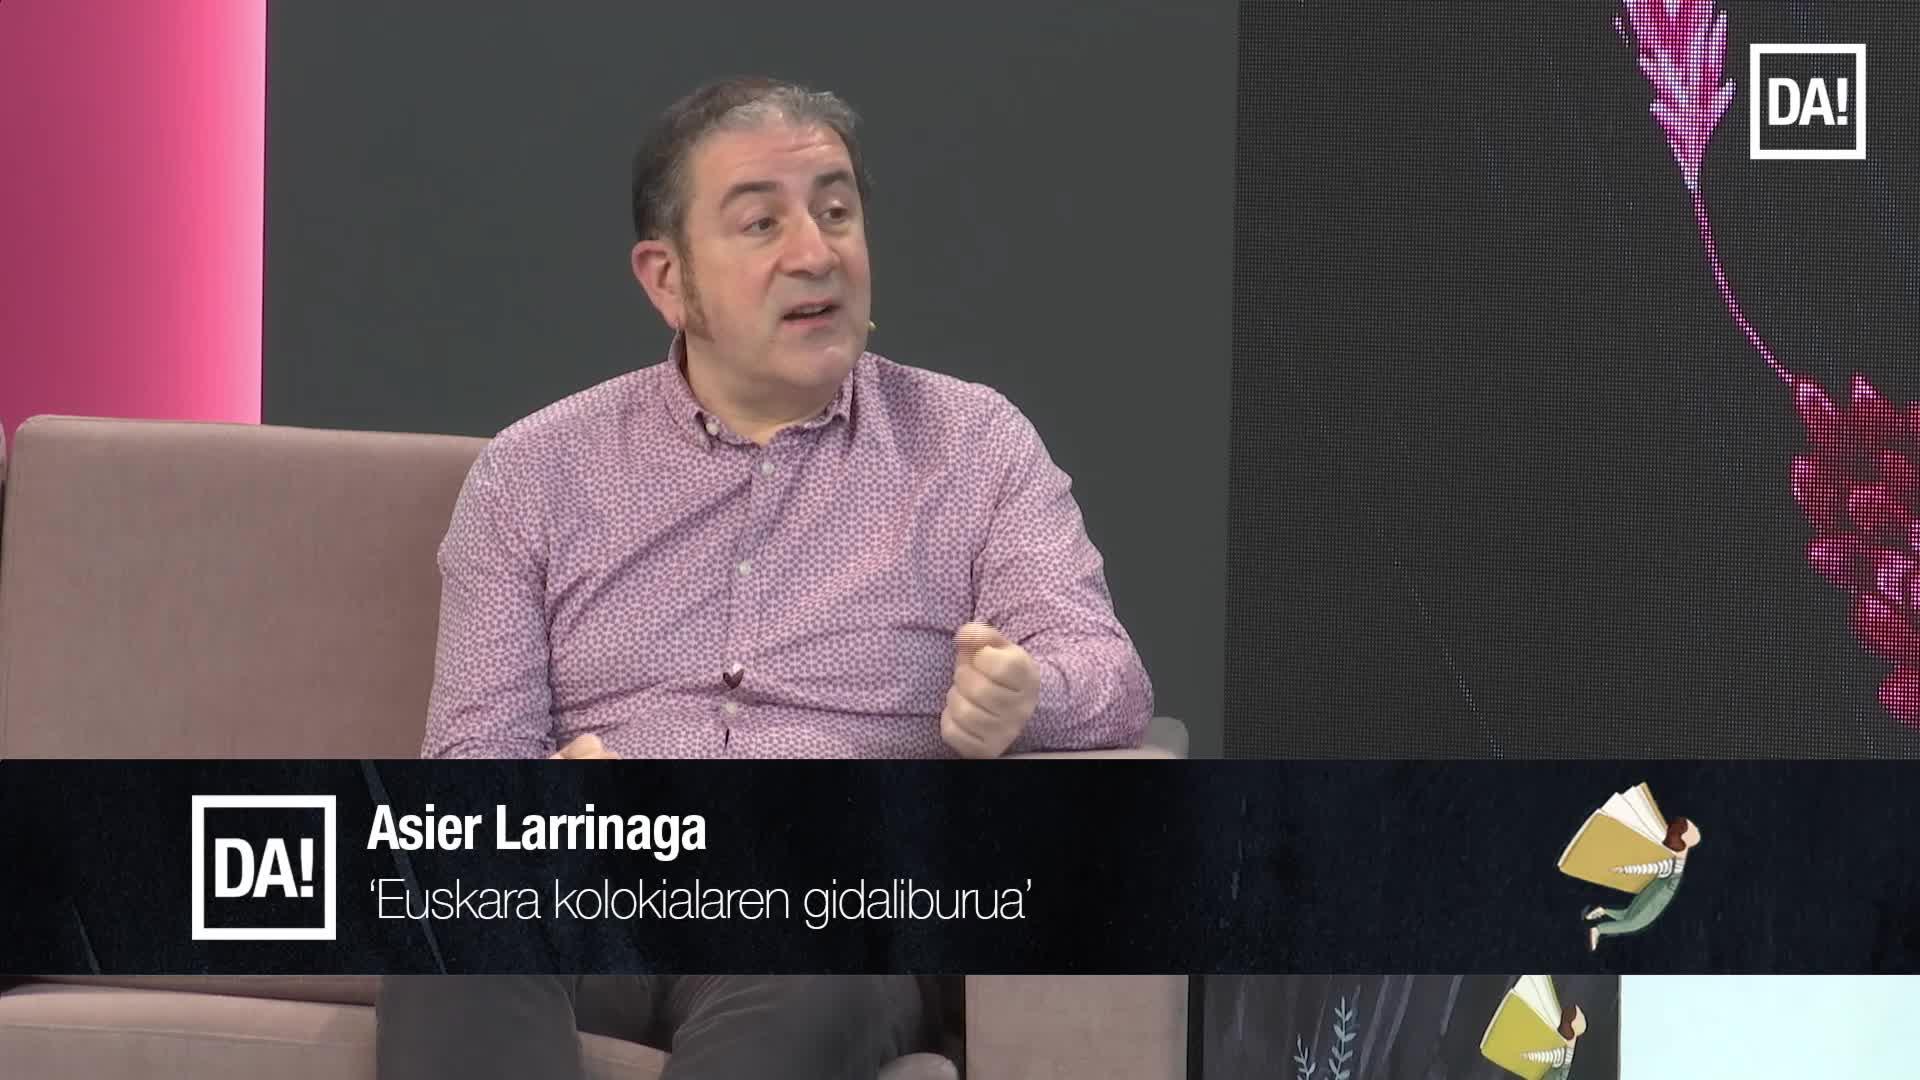 Asier Larrinaga